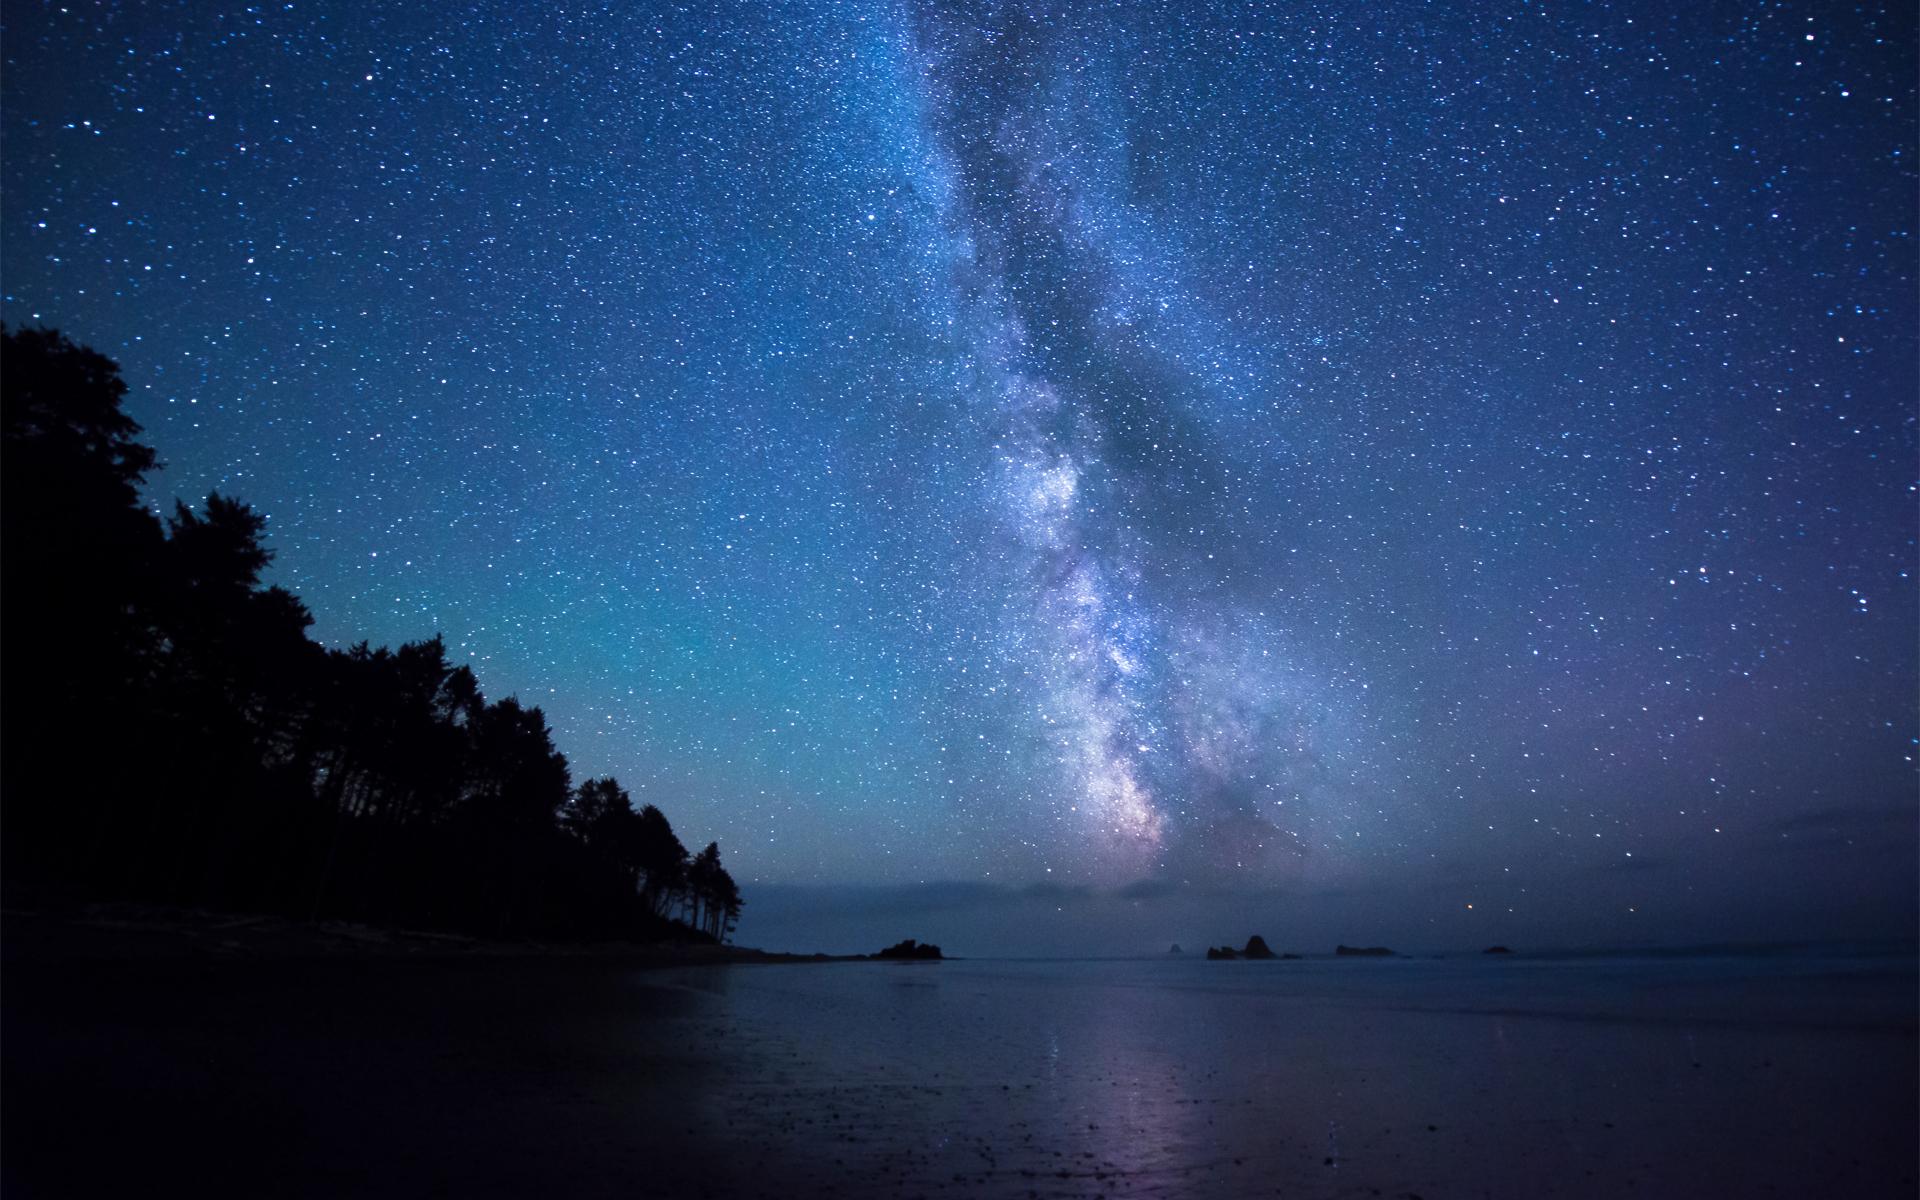 Andromeda by  Serge Narcissoff